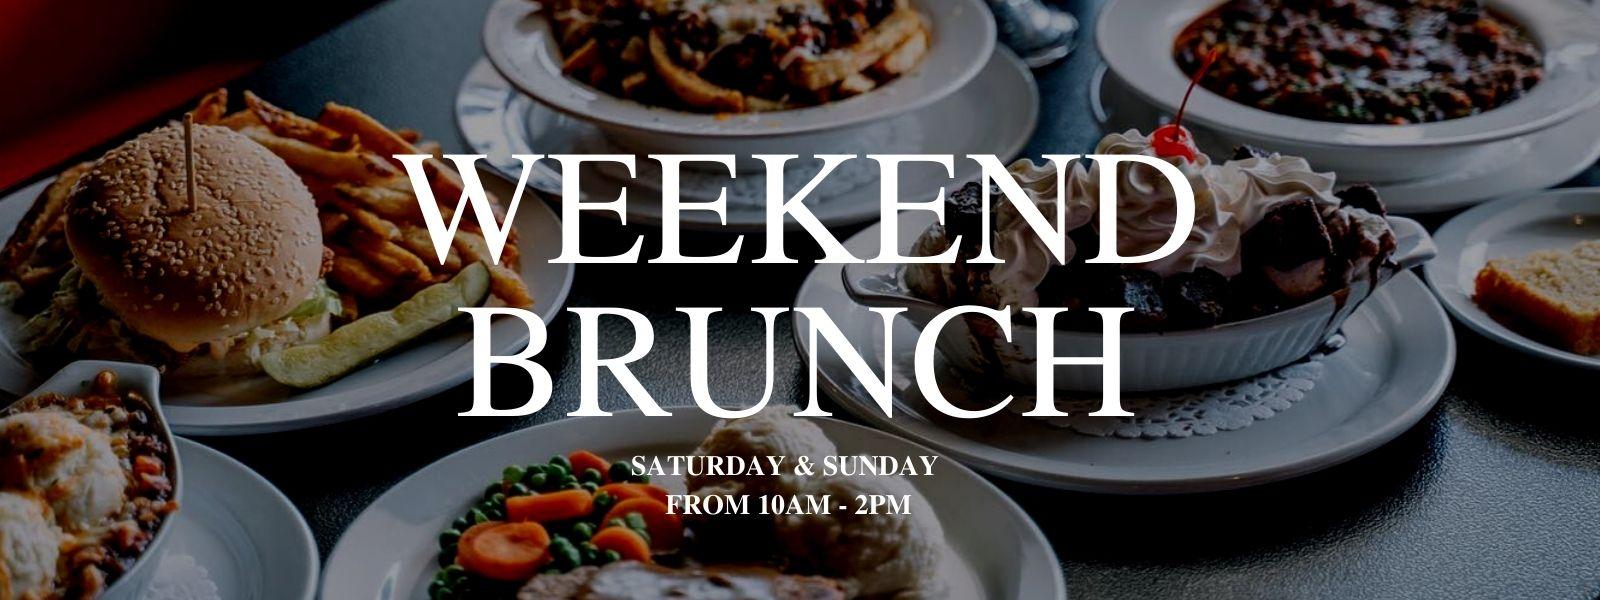 weekend brunch